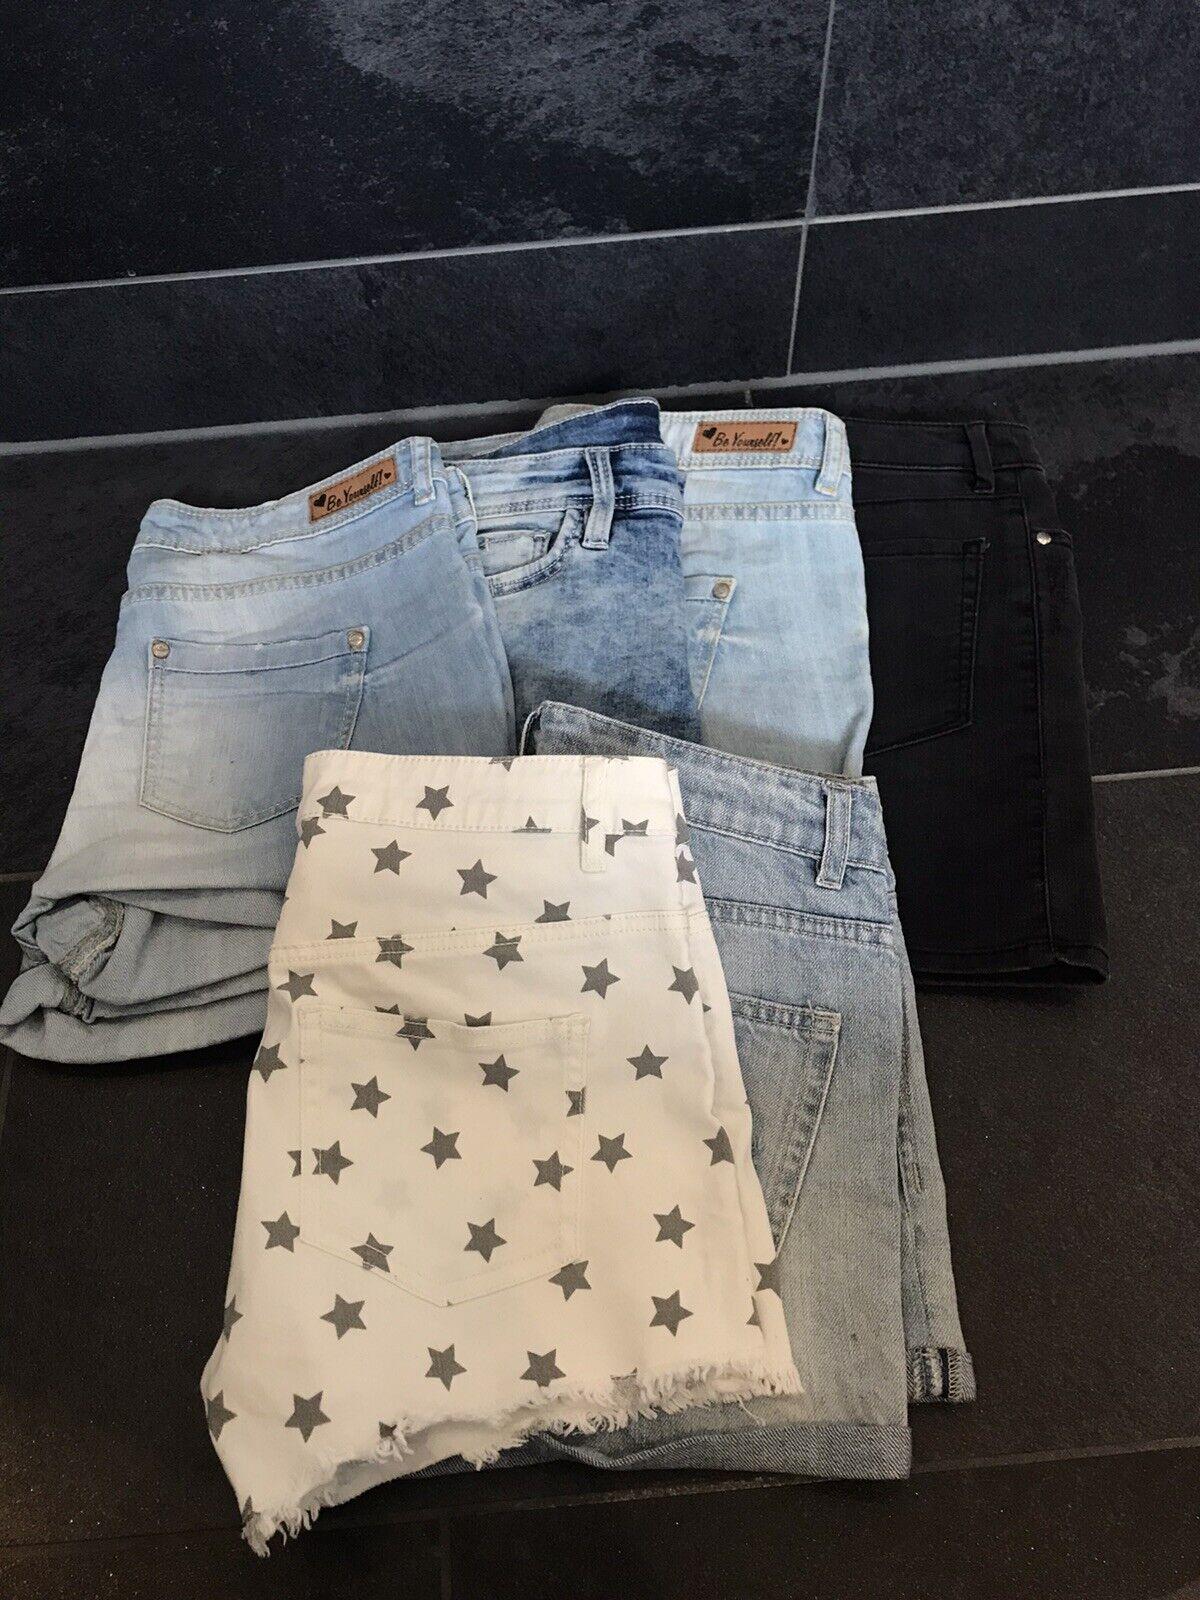 6-tlg. Set, Gr. 34/ XS 💥kurze Jeans 5x + 1 x Jeansrock schwarz 💥NEUWERTIG‼️Top